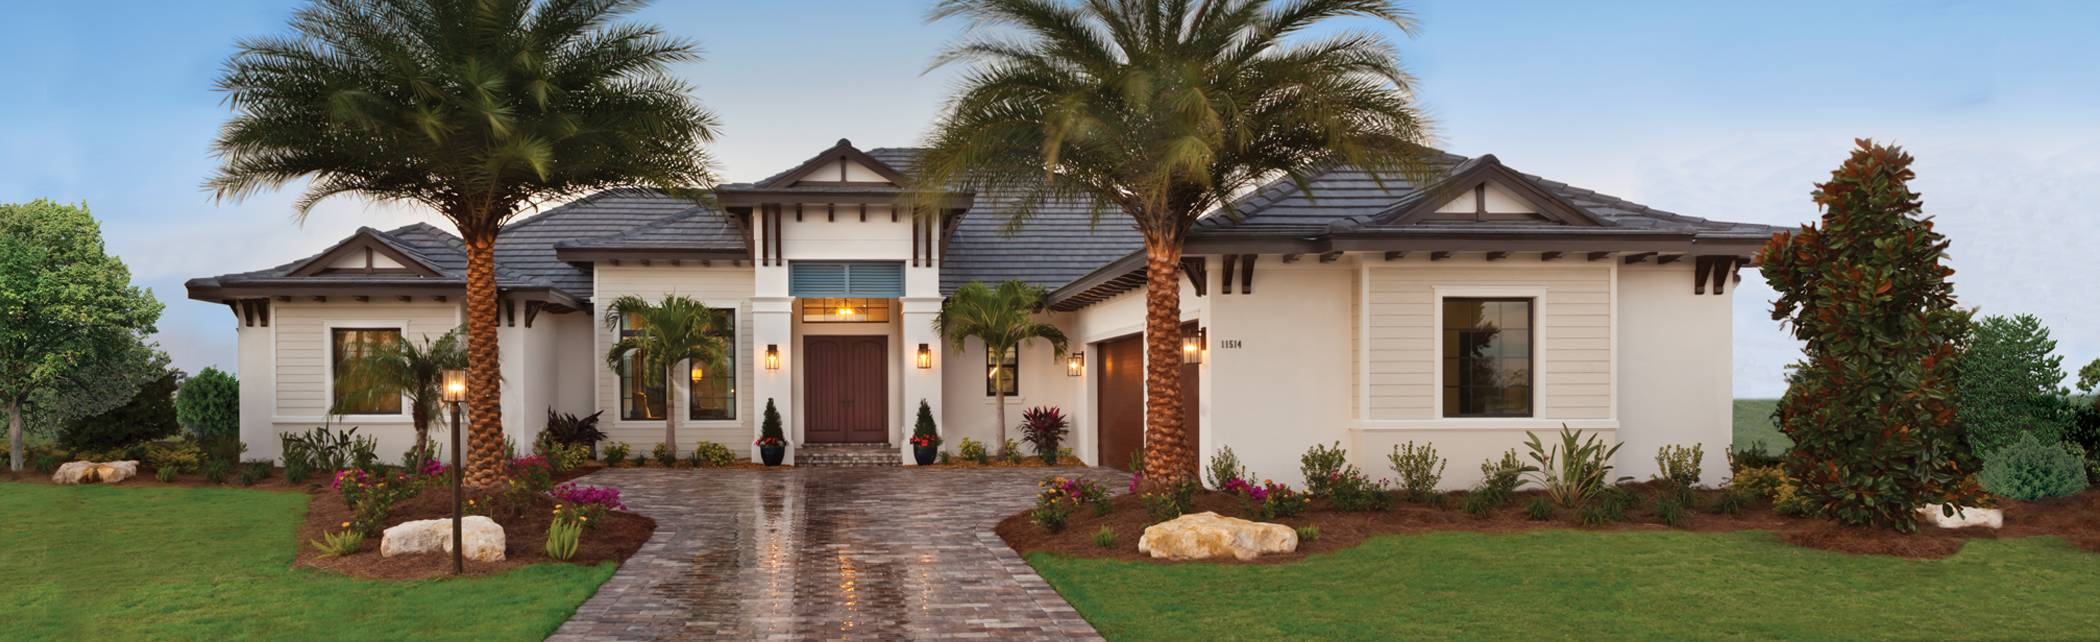 New Home Communities  Parrish Florida